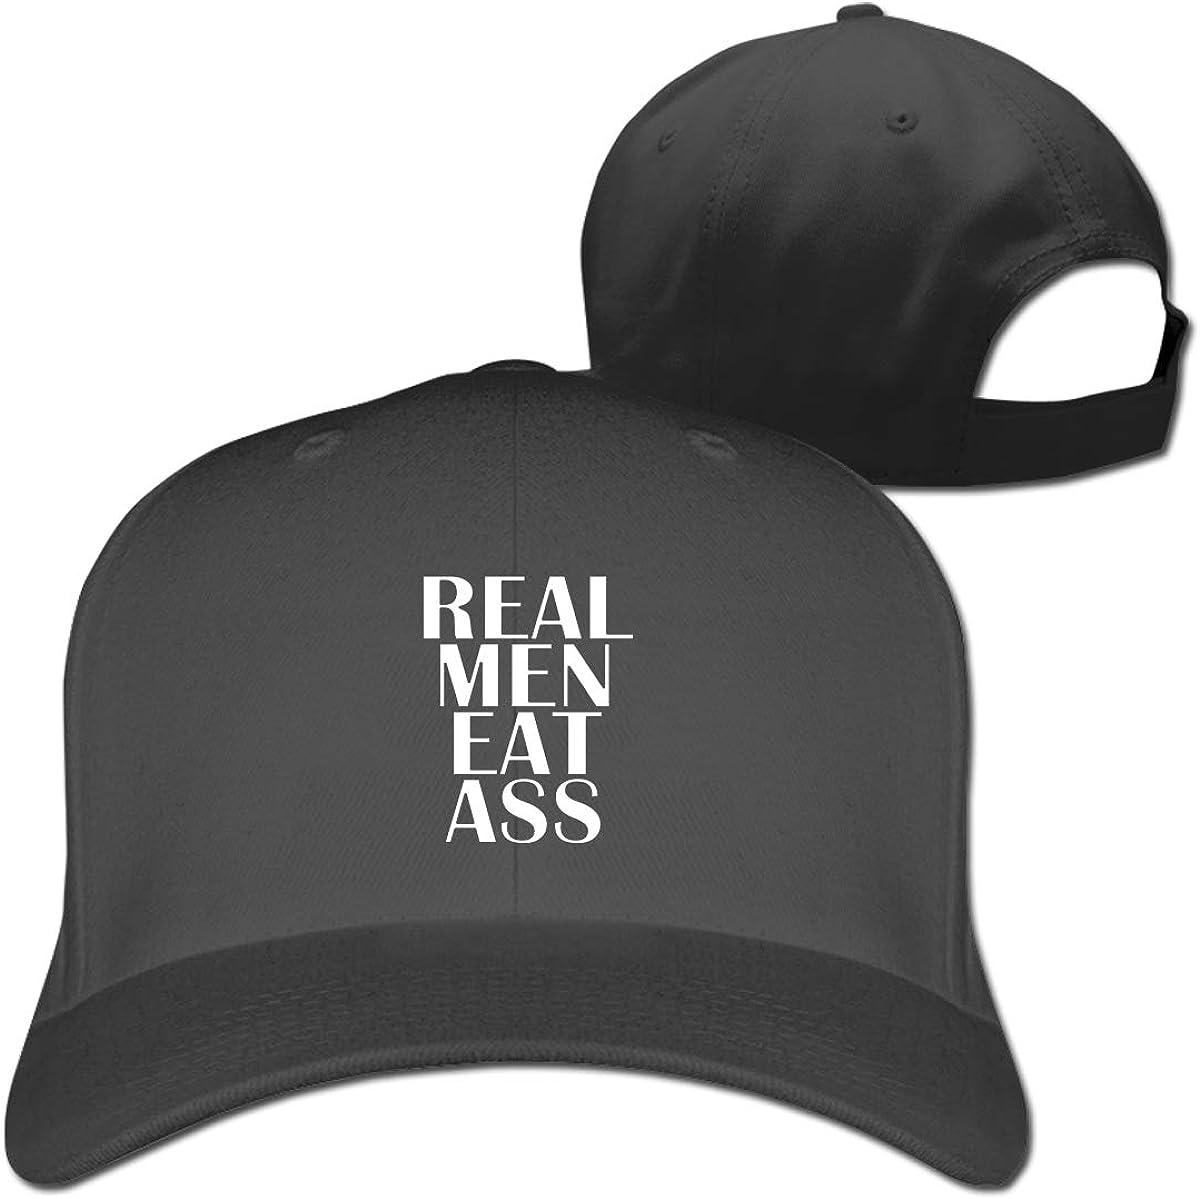 Real Men Eat Ass Fashion Adjustable Cotton Baseball Caps Trucker Driver Hat Outdoor Cap Black